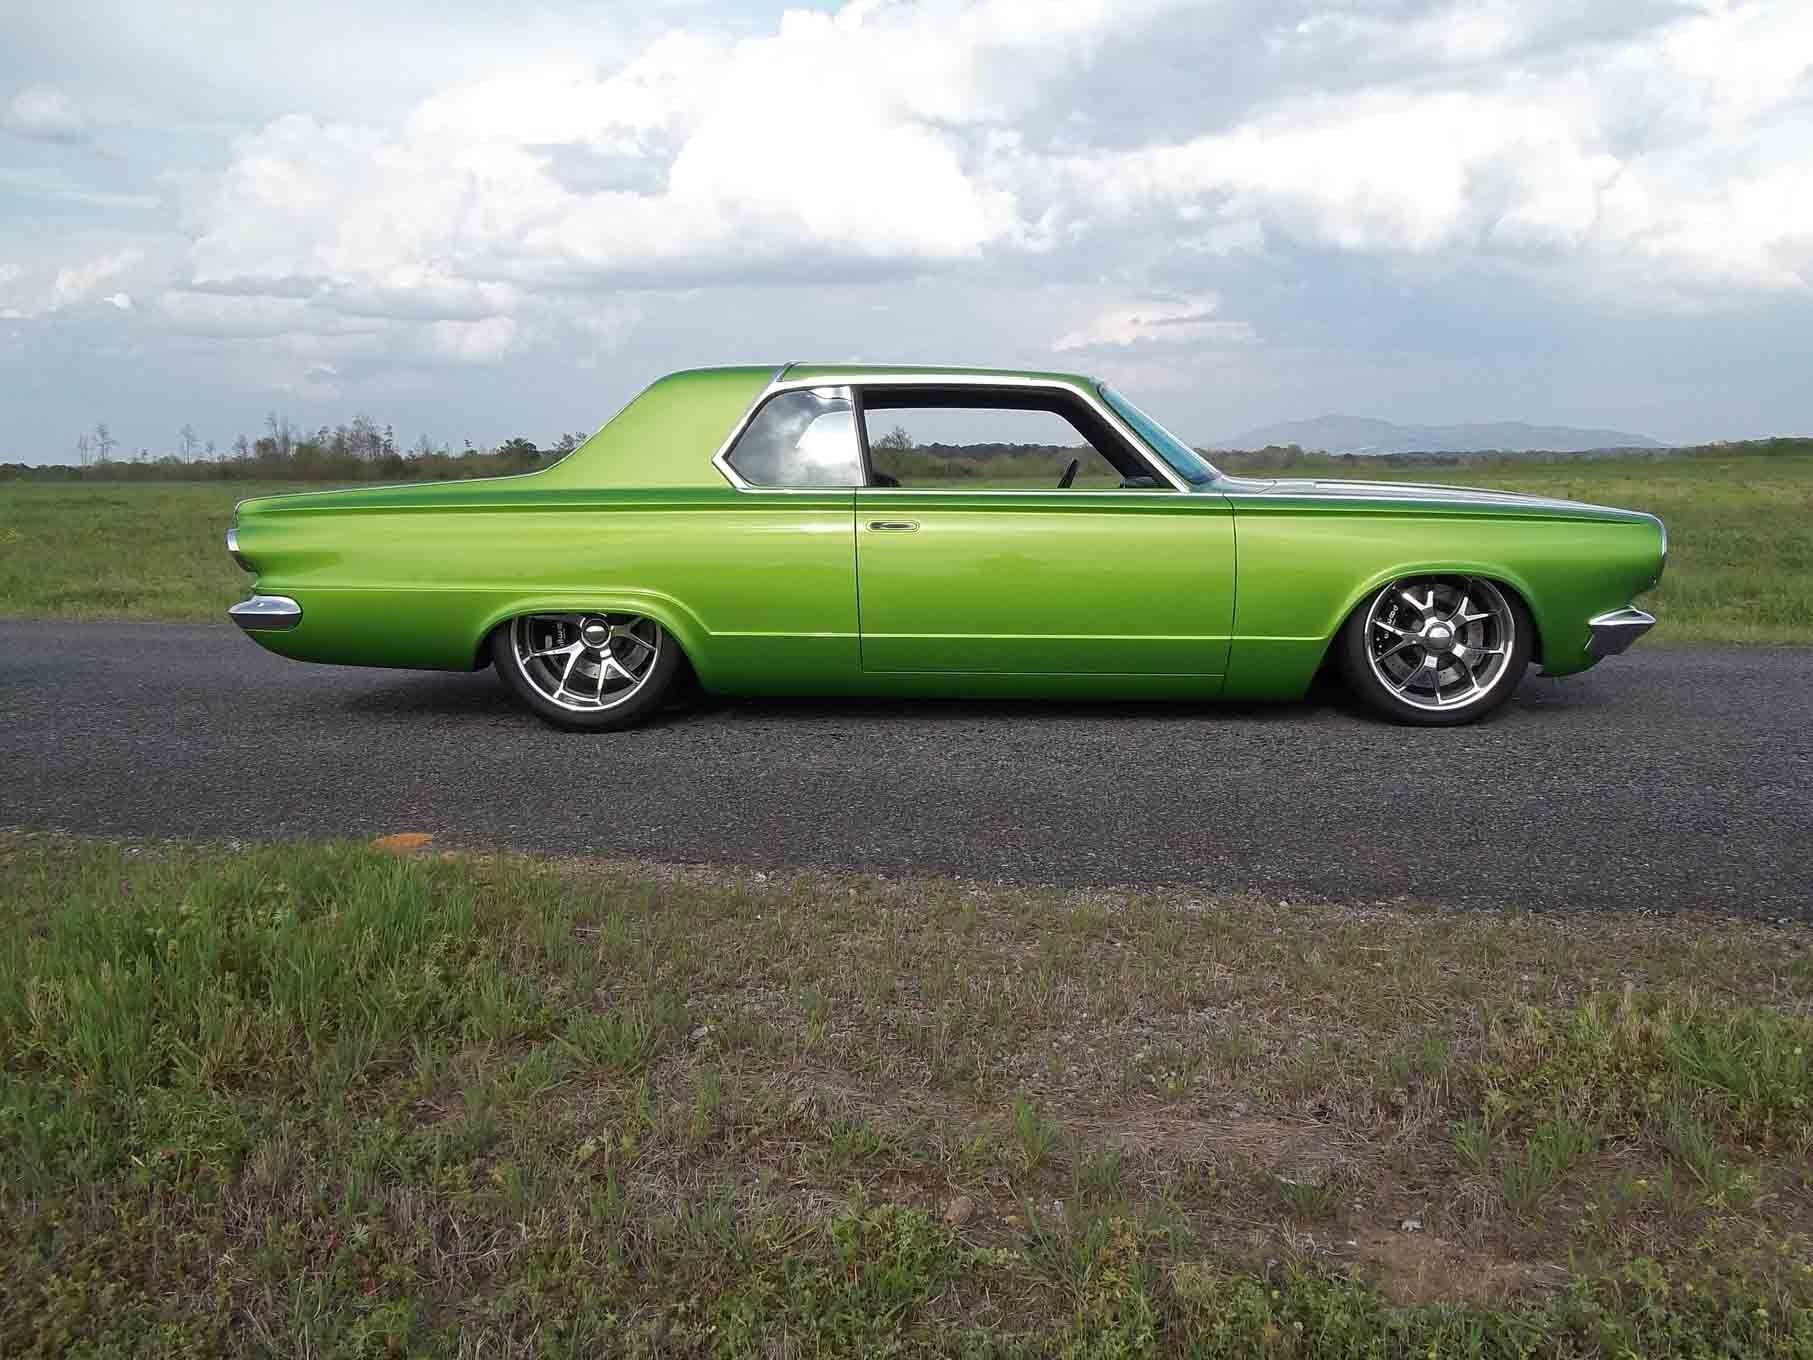 1965 dodge dart coupe hardtop street machine pro touring green usa 07 wallpaper 1813x1360 761598 wallpaperup